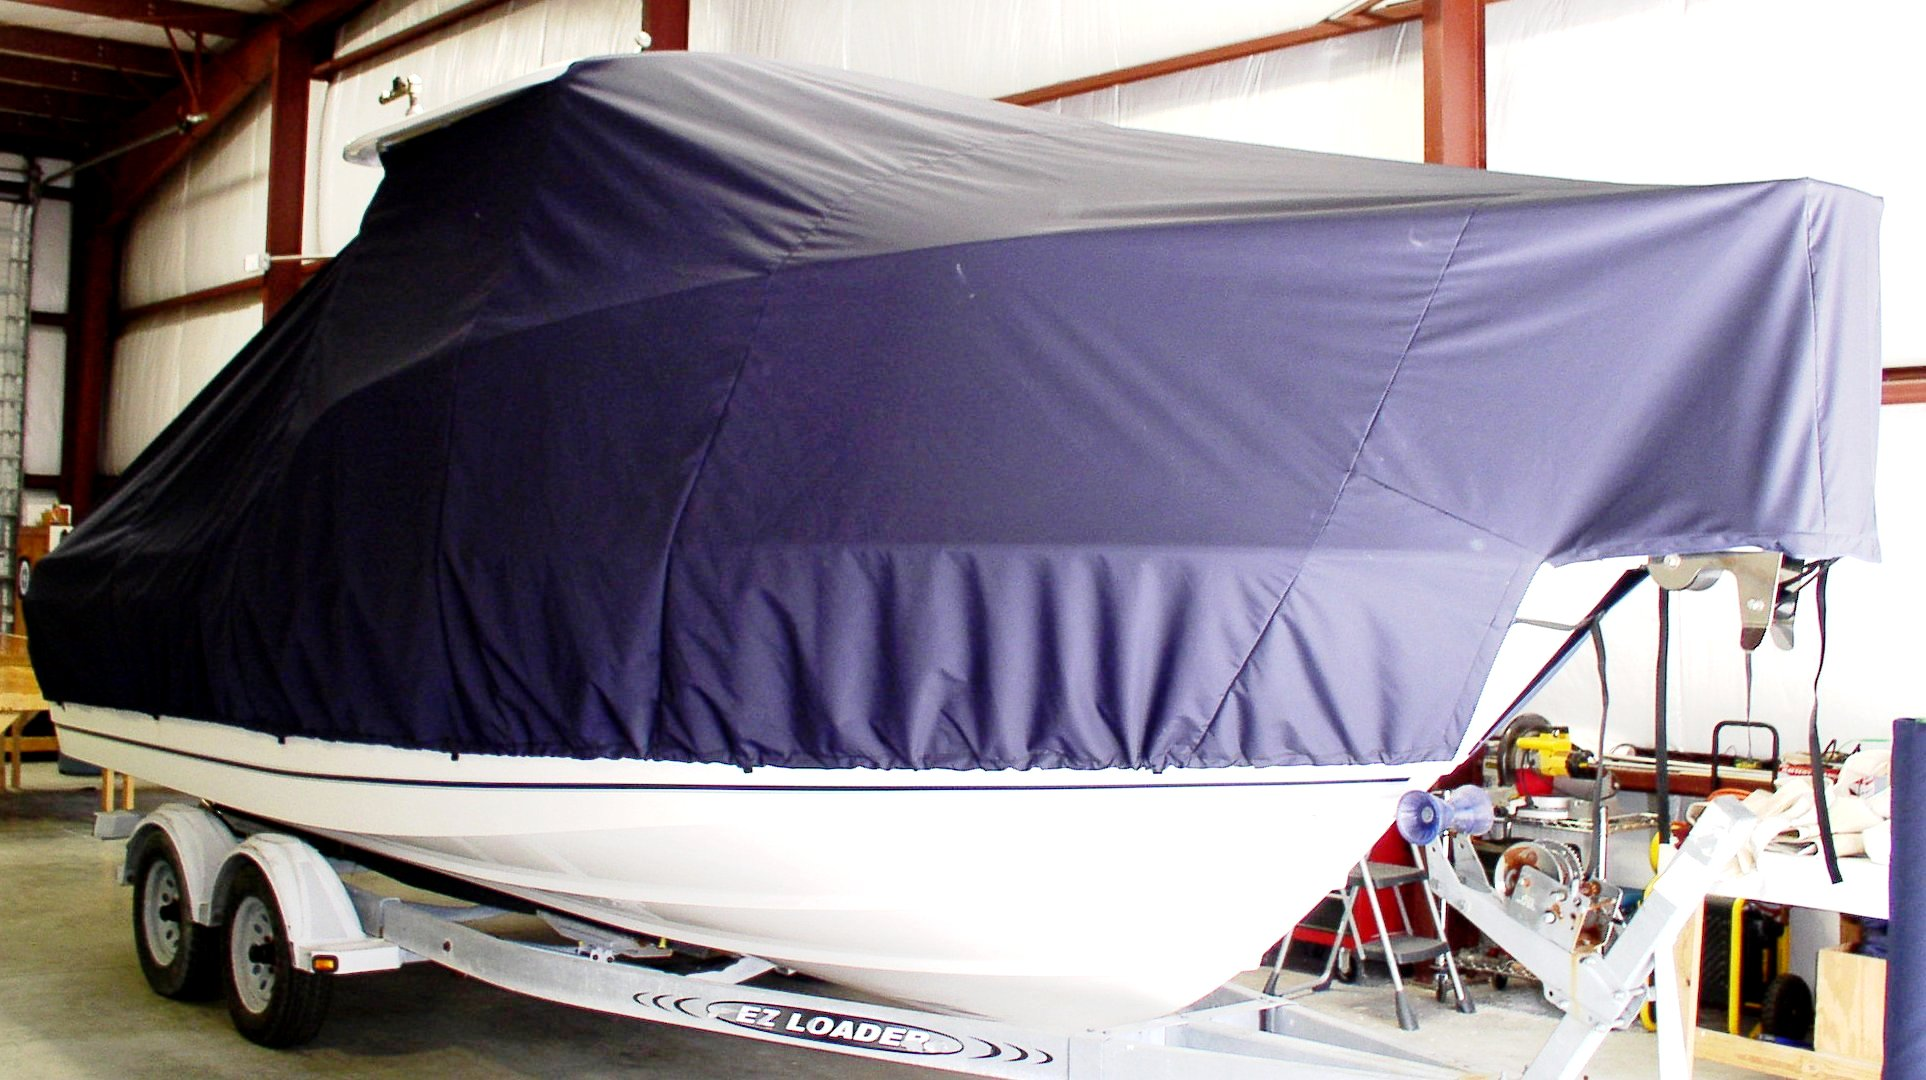 Boat Covers Factory Original Equipment Oem And Custom